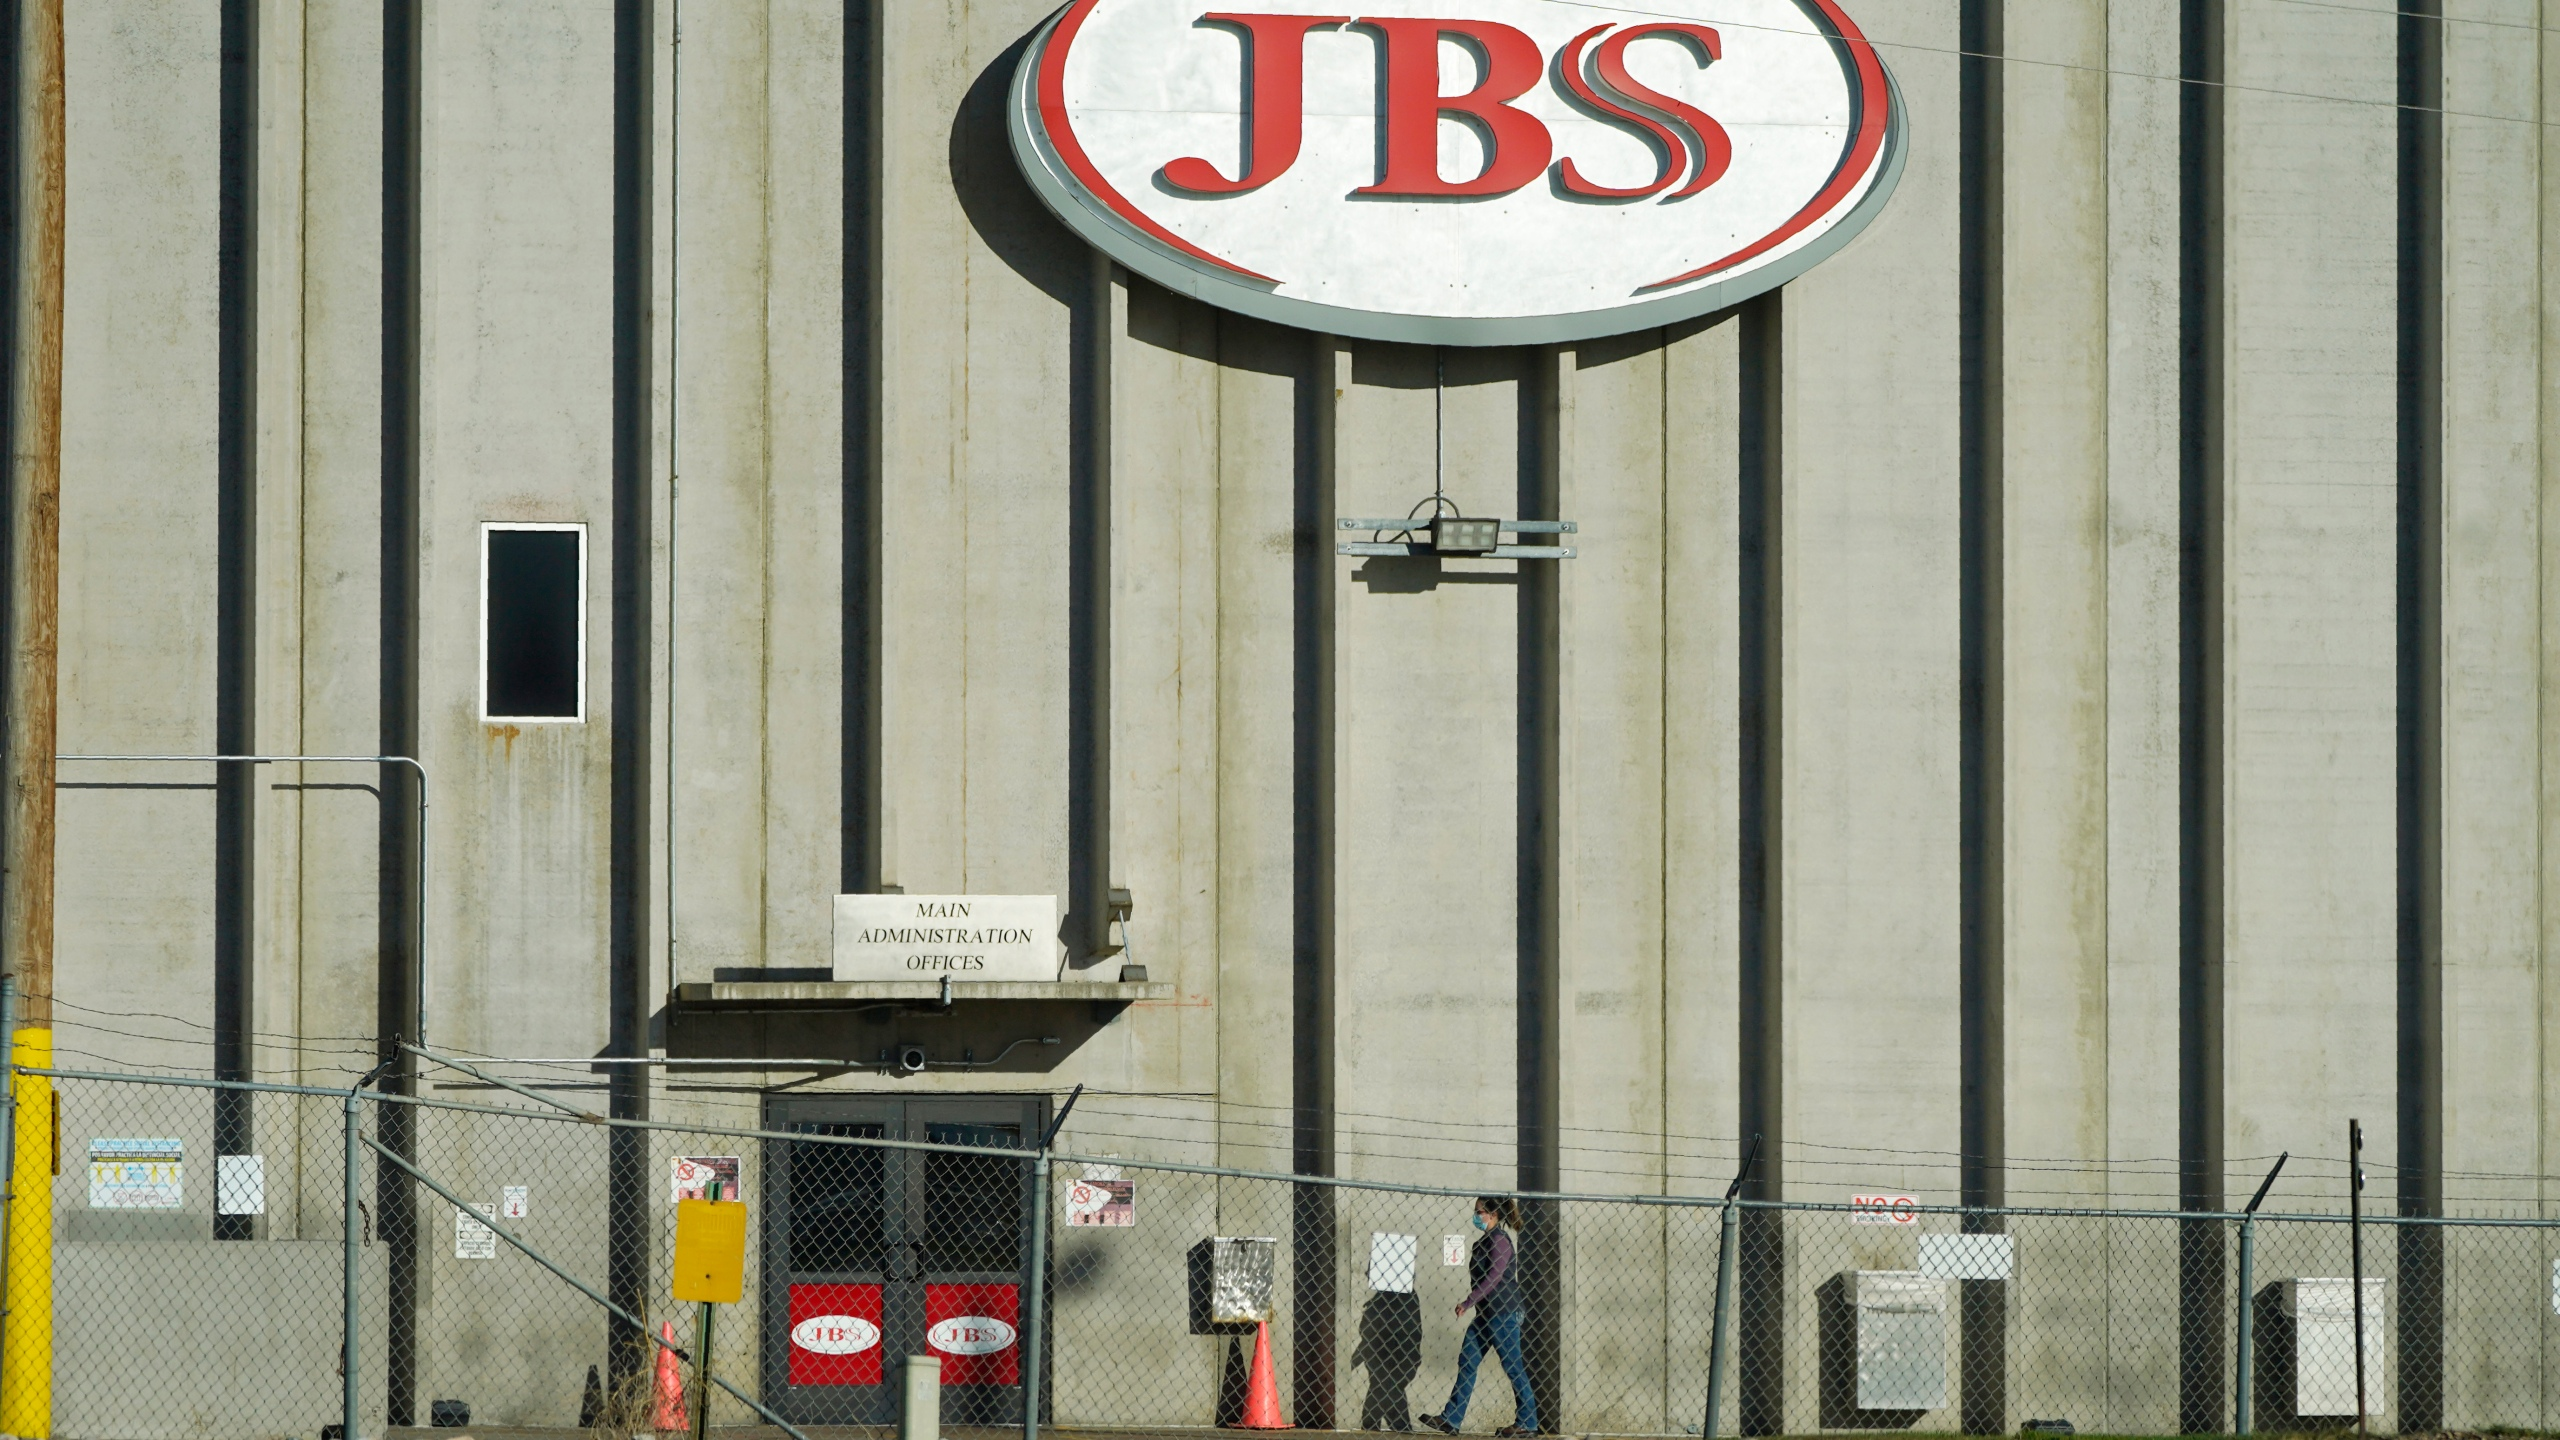 image of a JBS facility